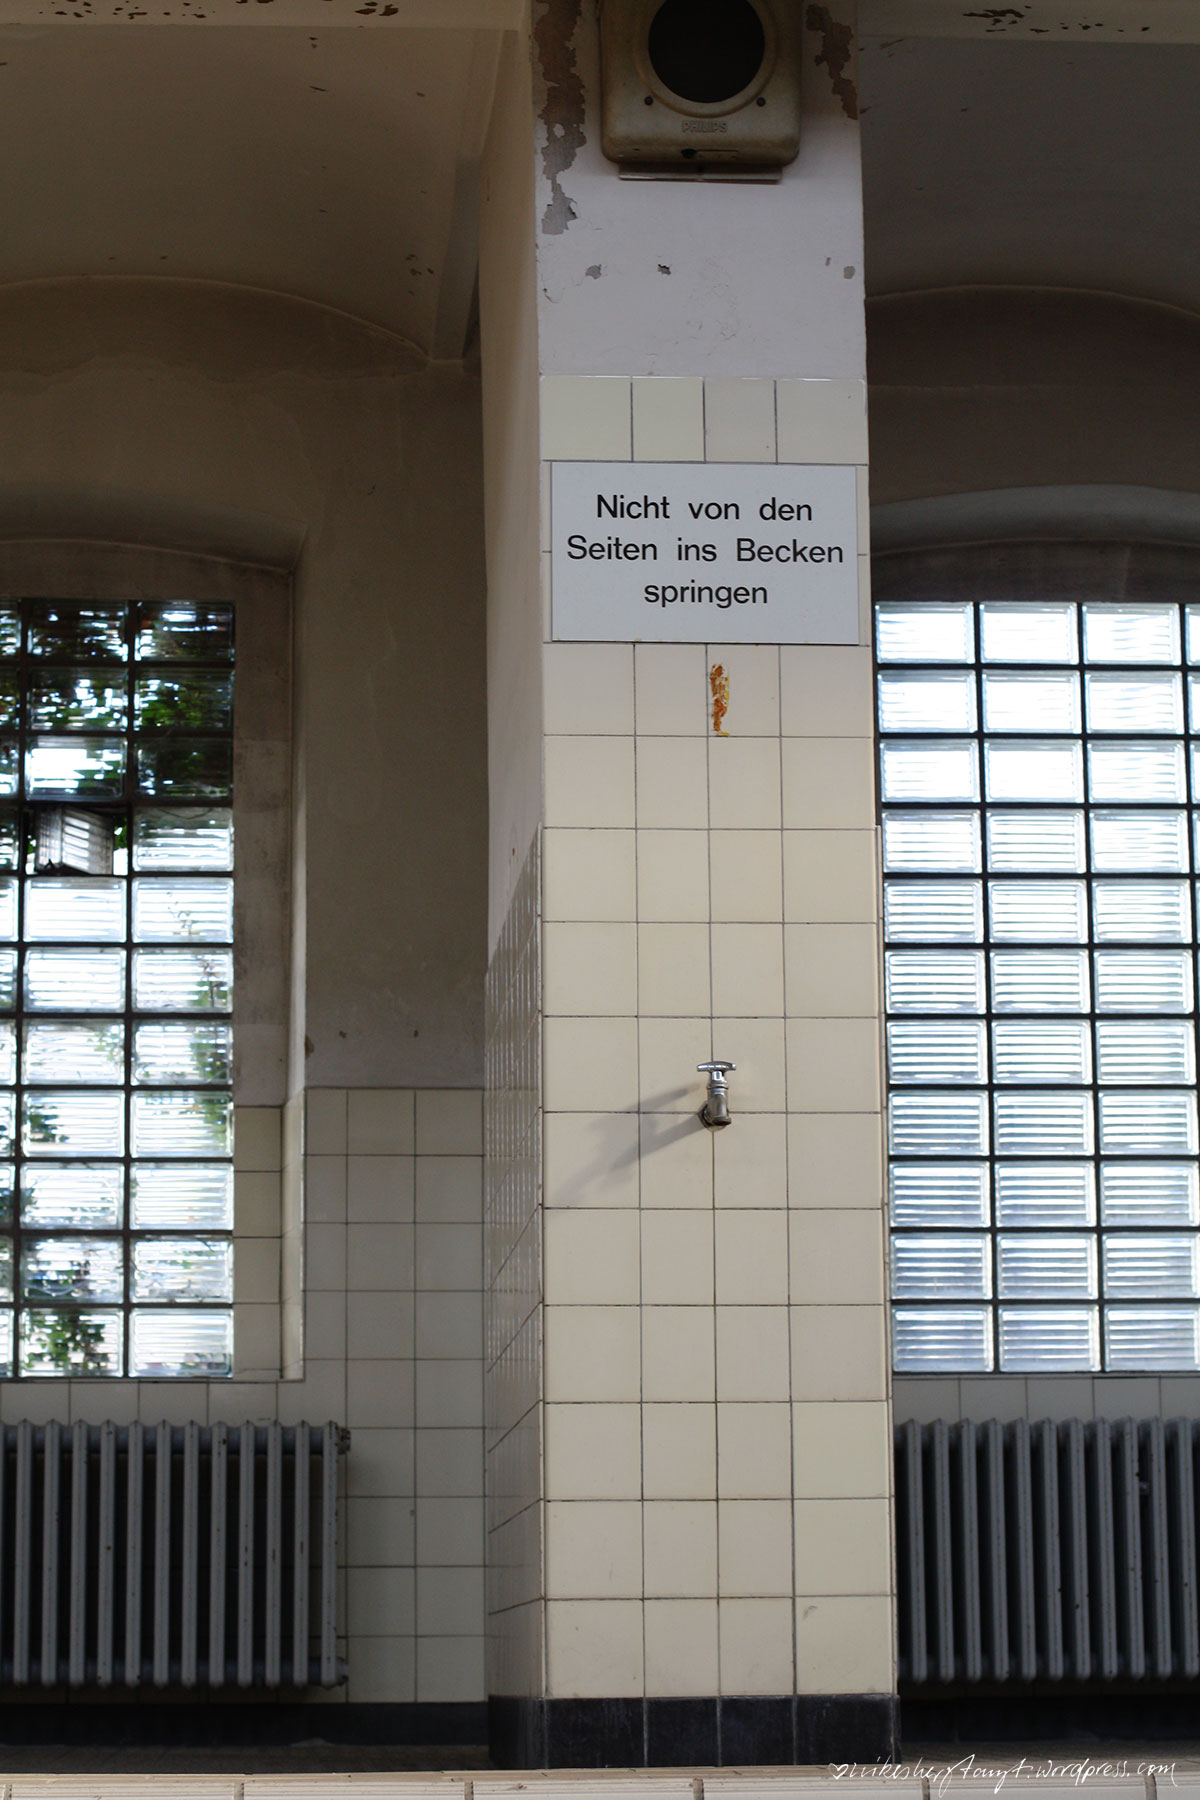 stadtbad, krefeld, badeanstalt, glück auf, tiefgang, lost places, nikesherztanzt